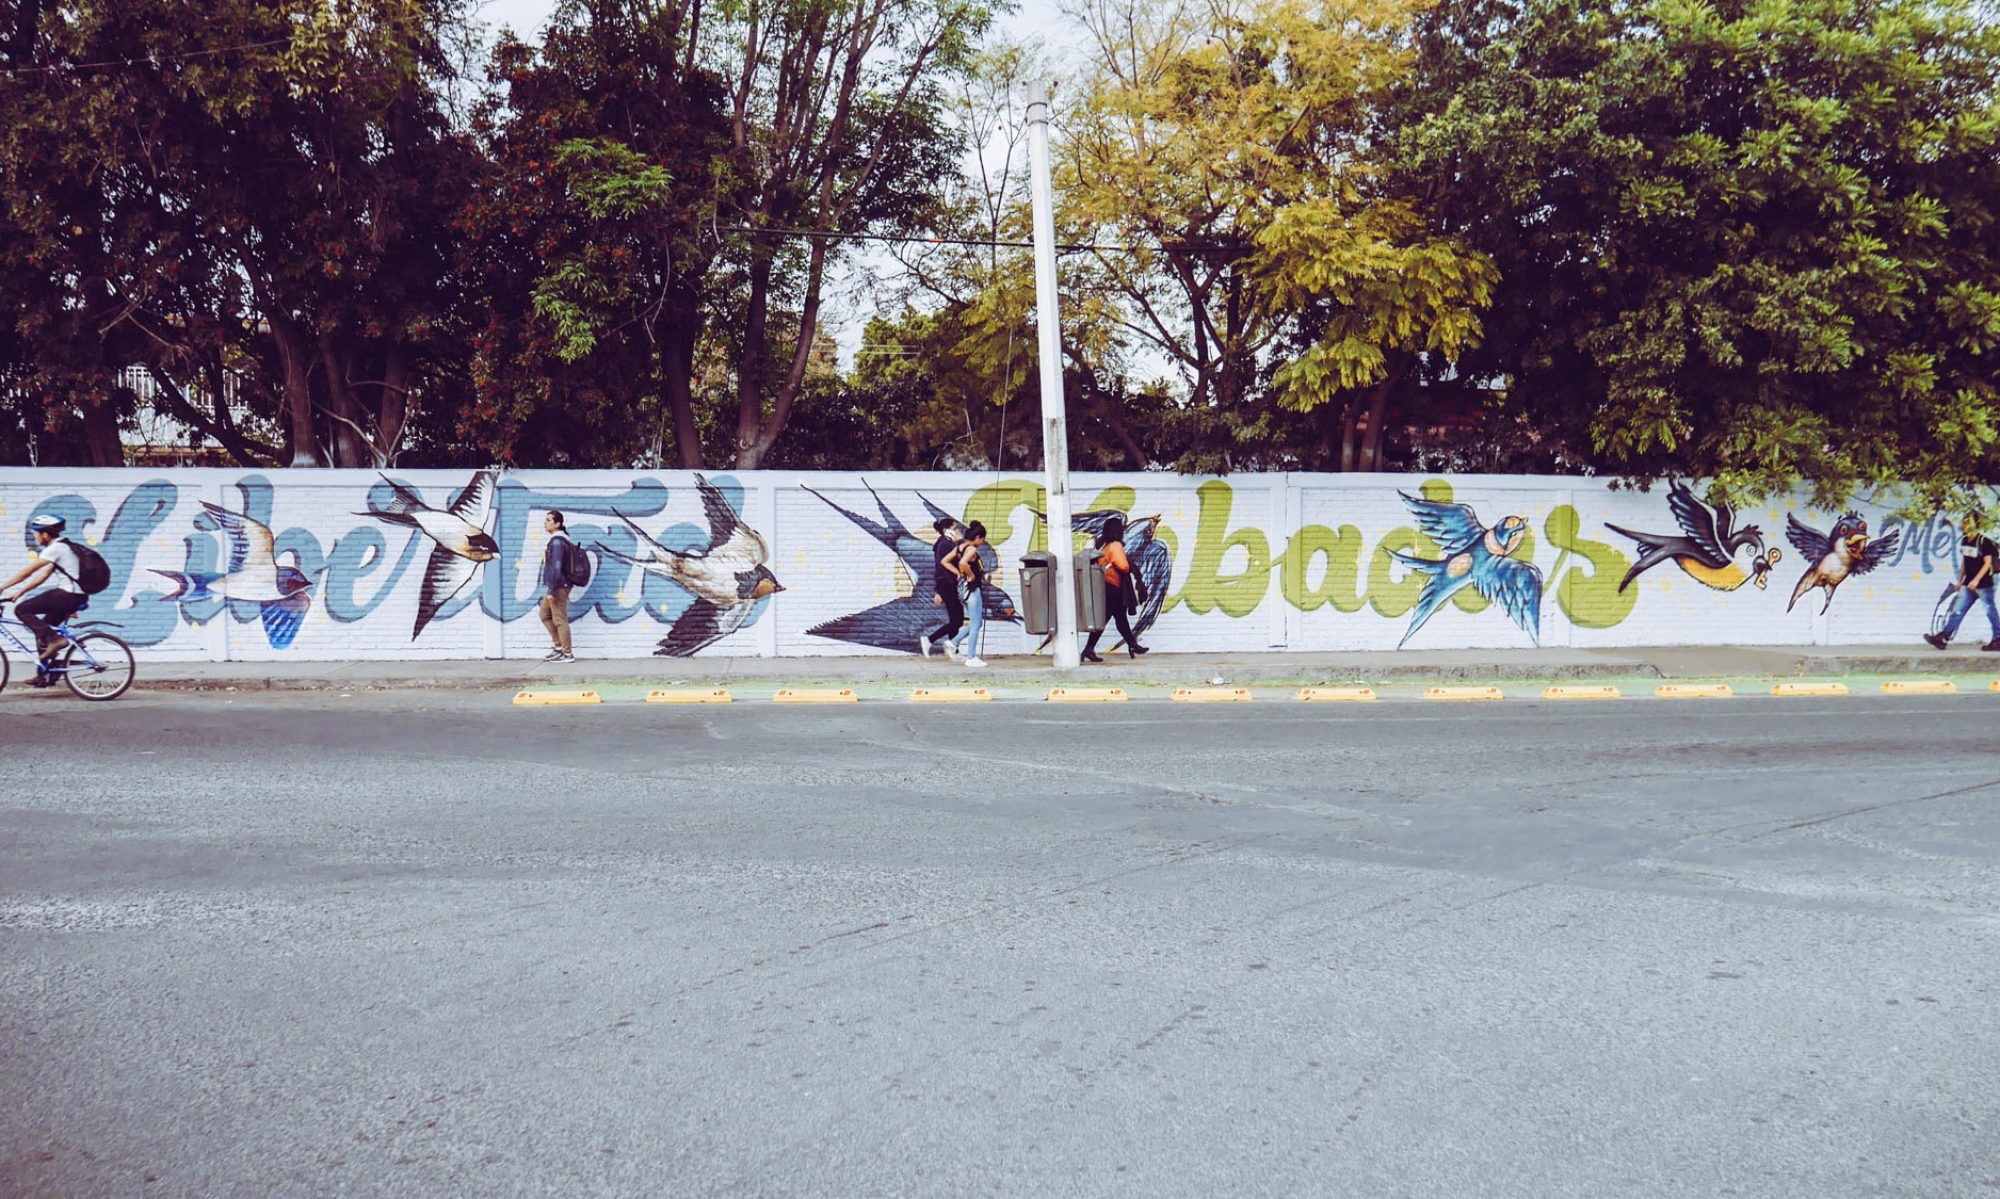 Nueve Arte Urbano